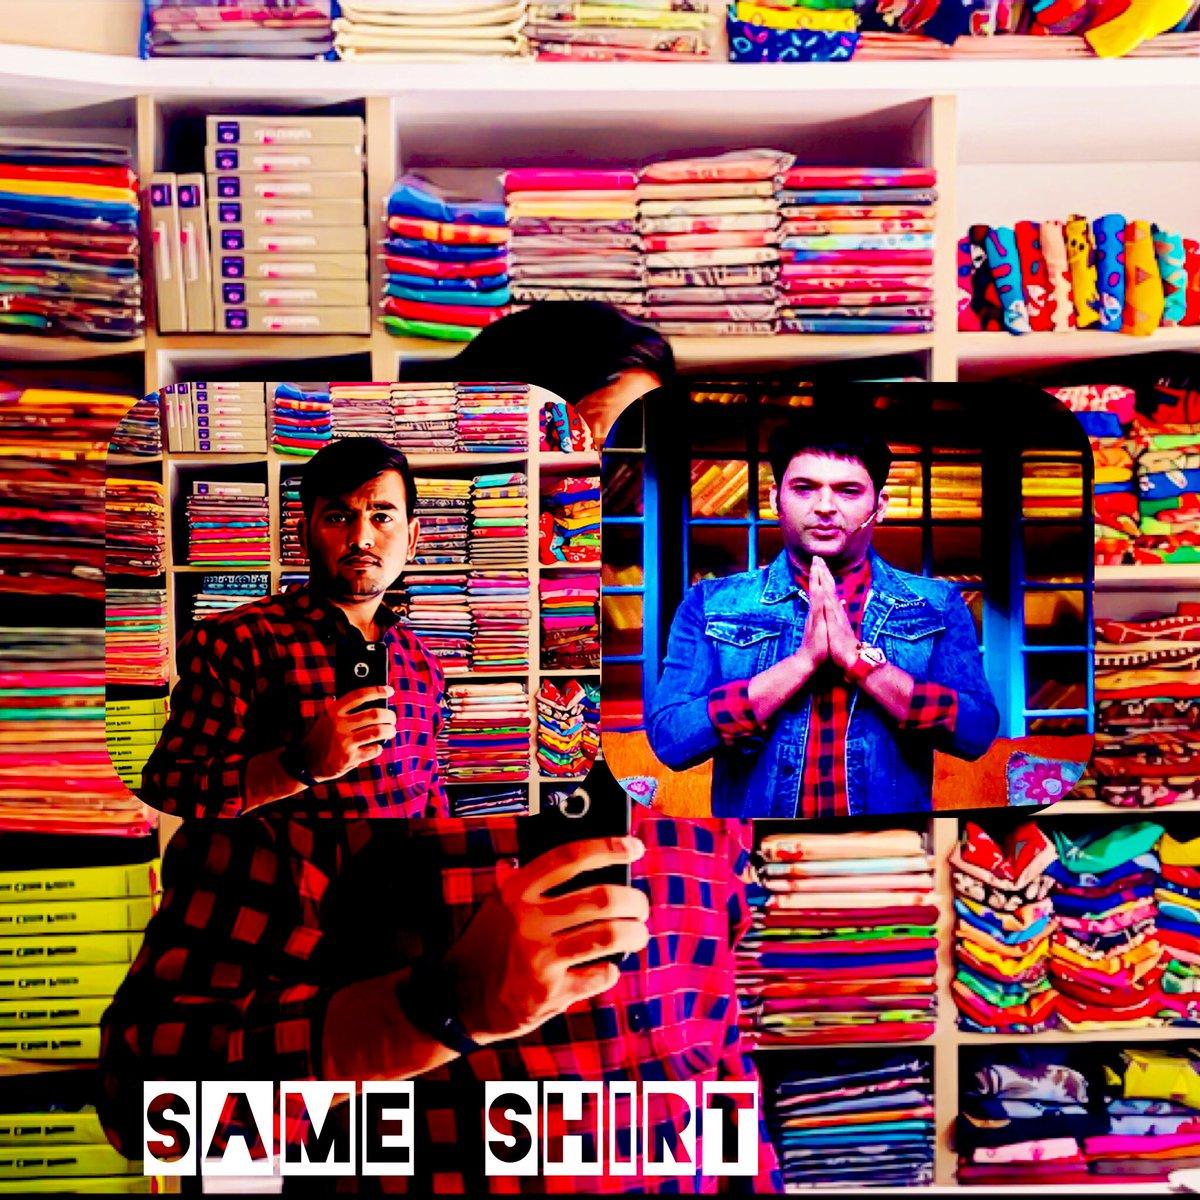 Wow 😮 @KapilSharmaK9 Sir Same Shirt 👔 🤷🏻♂️😍😍😍❤️❤️❤️ tonight's Episode Buhut Maza Aara hain #TheKapilSharmaShow @GulshanGroverGG sir @almostbharat @kikusharda @sumona24 @haanjichandan @Krushna_KAS @apshaha